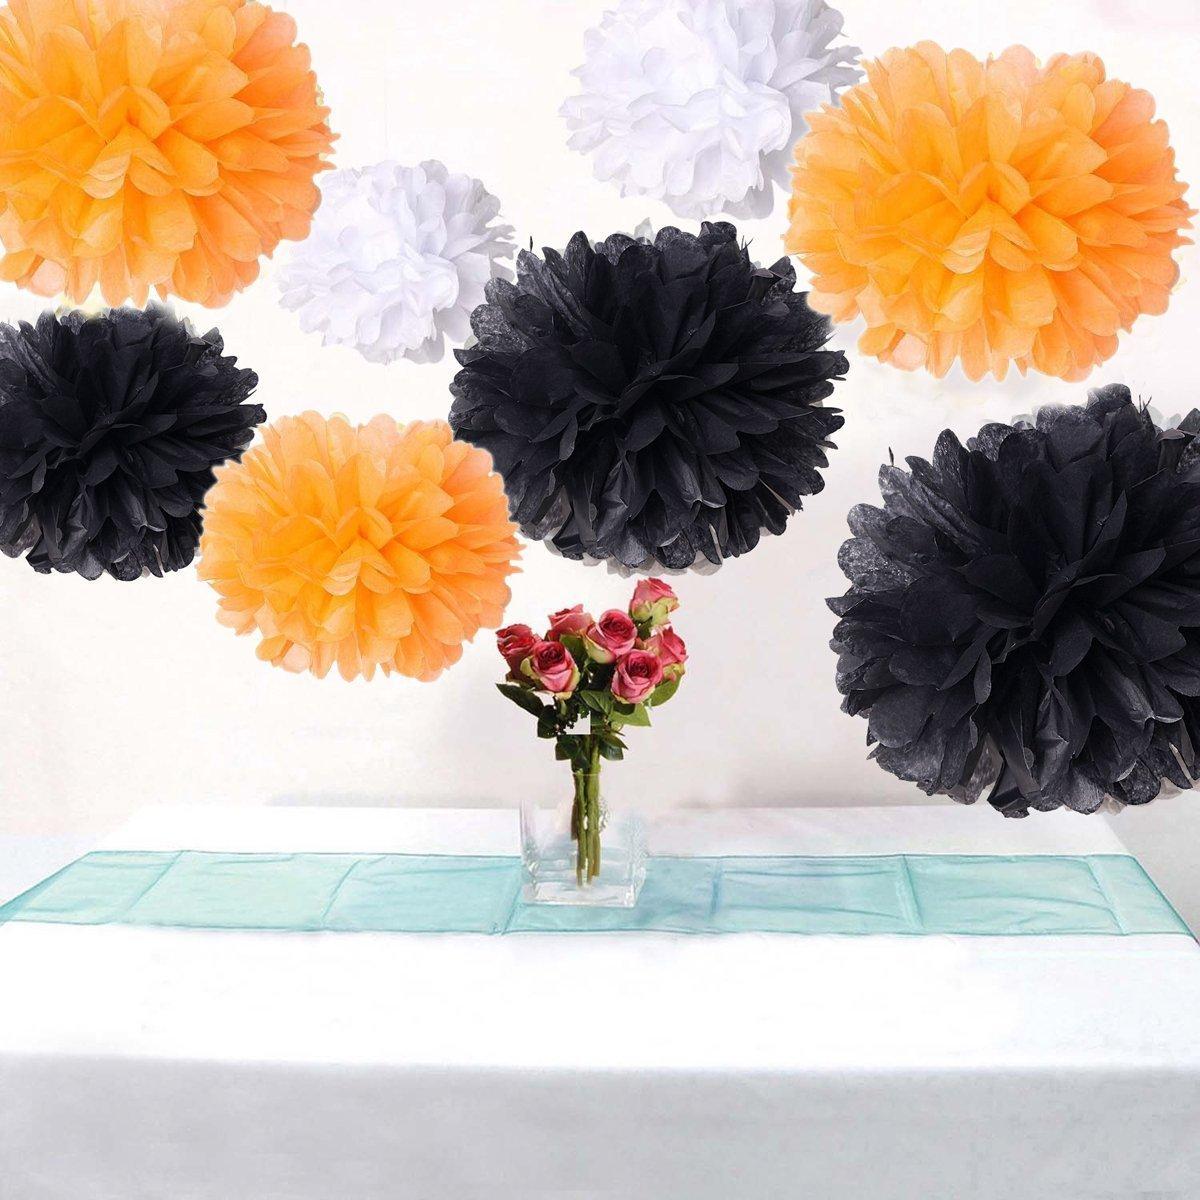 18PCS Mixed Orange Black White Tissue Paper Flower Pom Poms Pompoms Wedding Birthday Party Nursery Decoration dreammadestudio